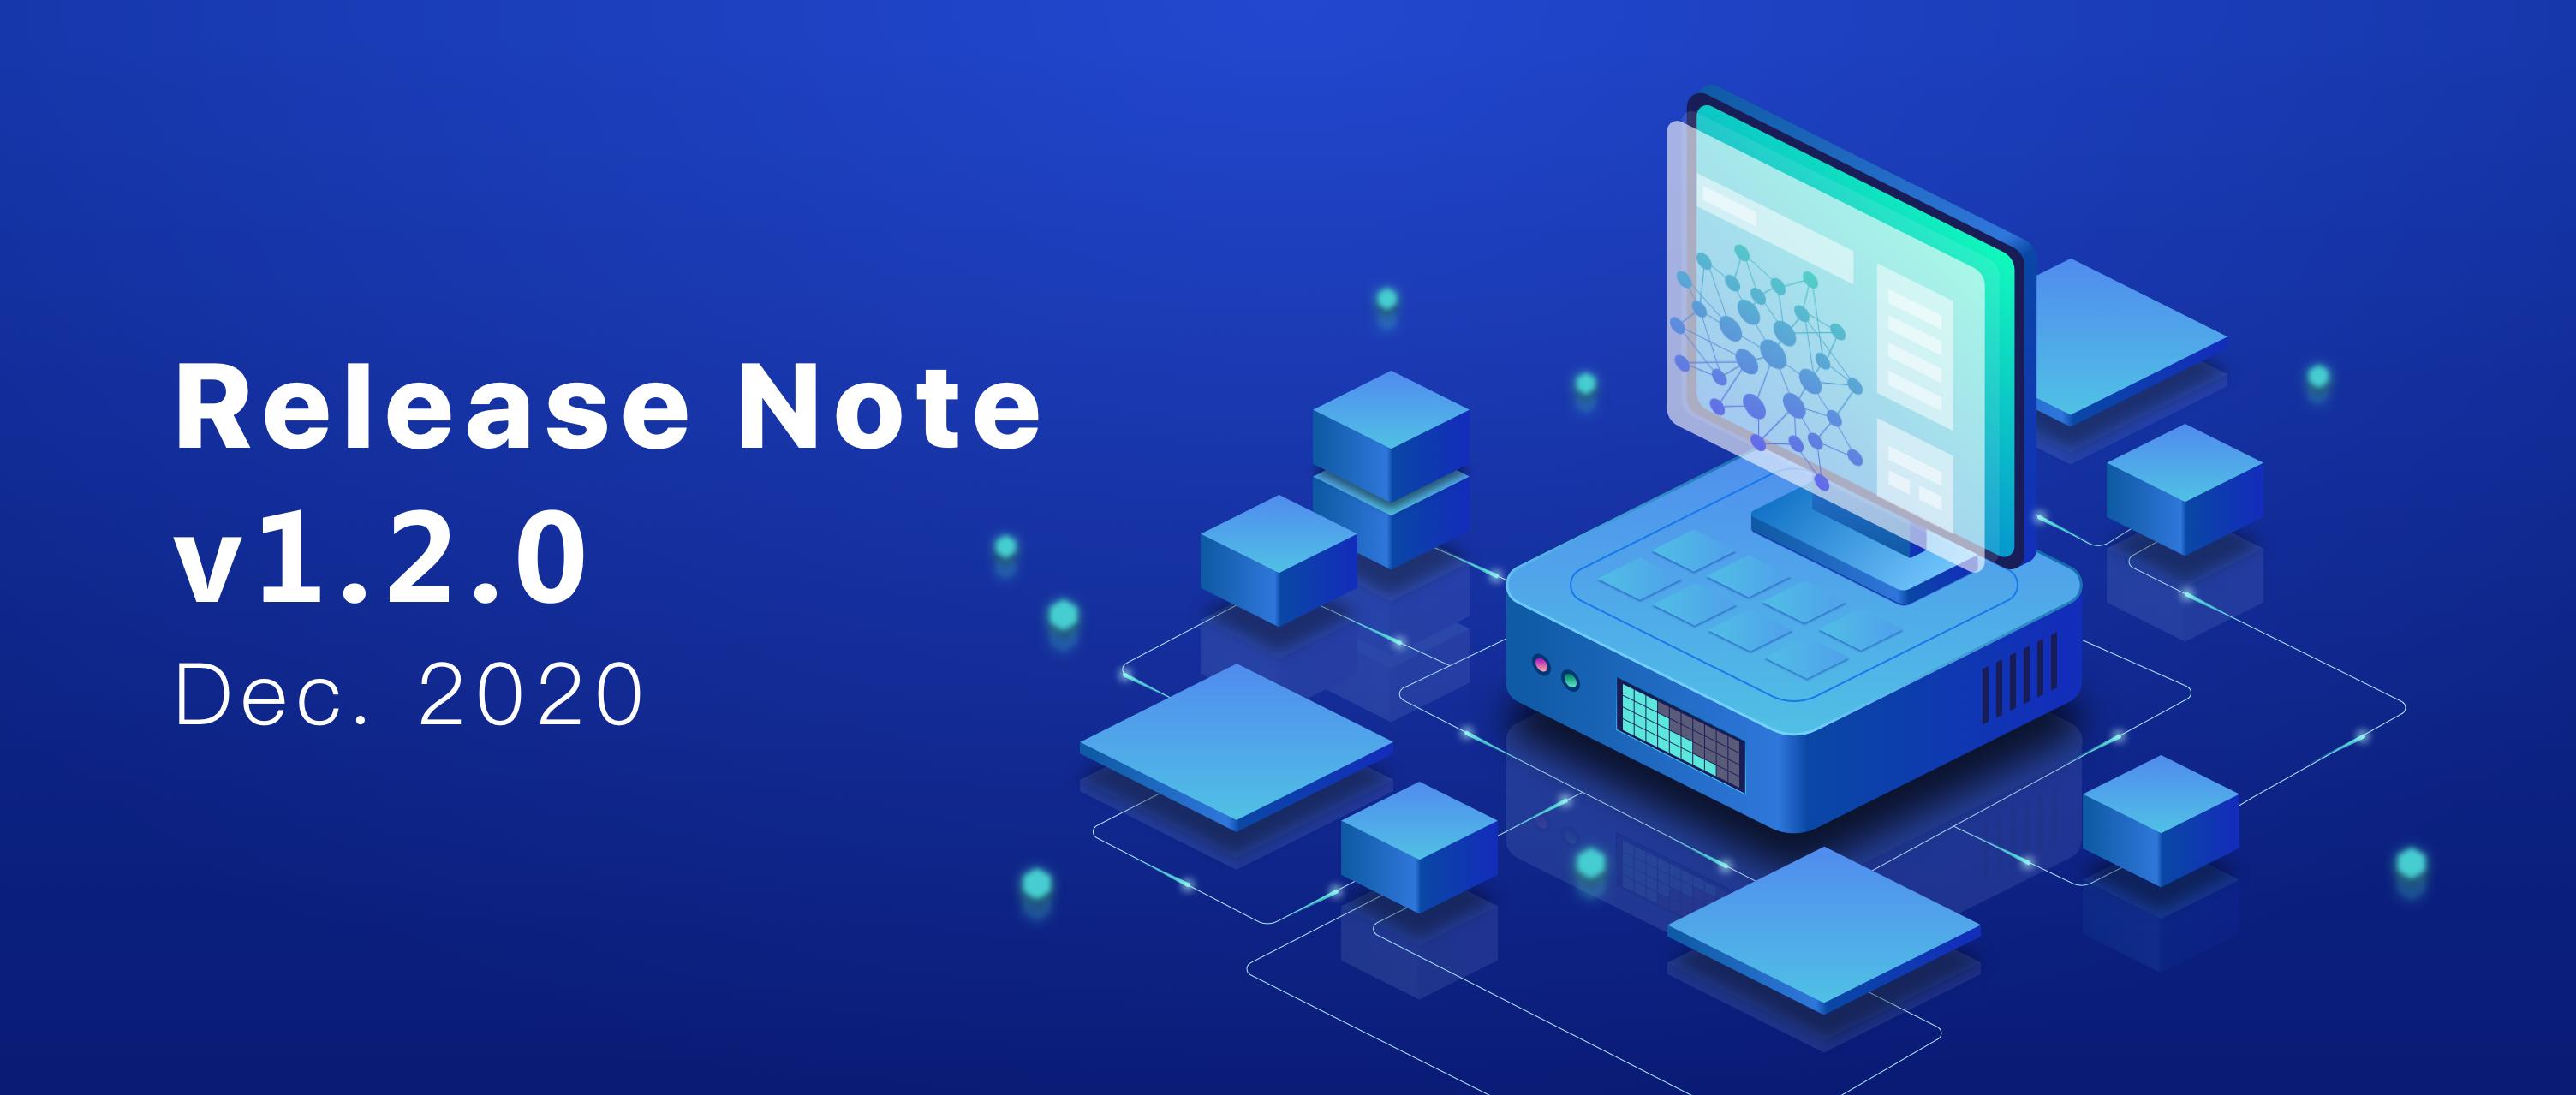 Nebula Graph v1.2.0 release note